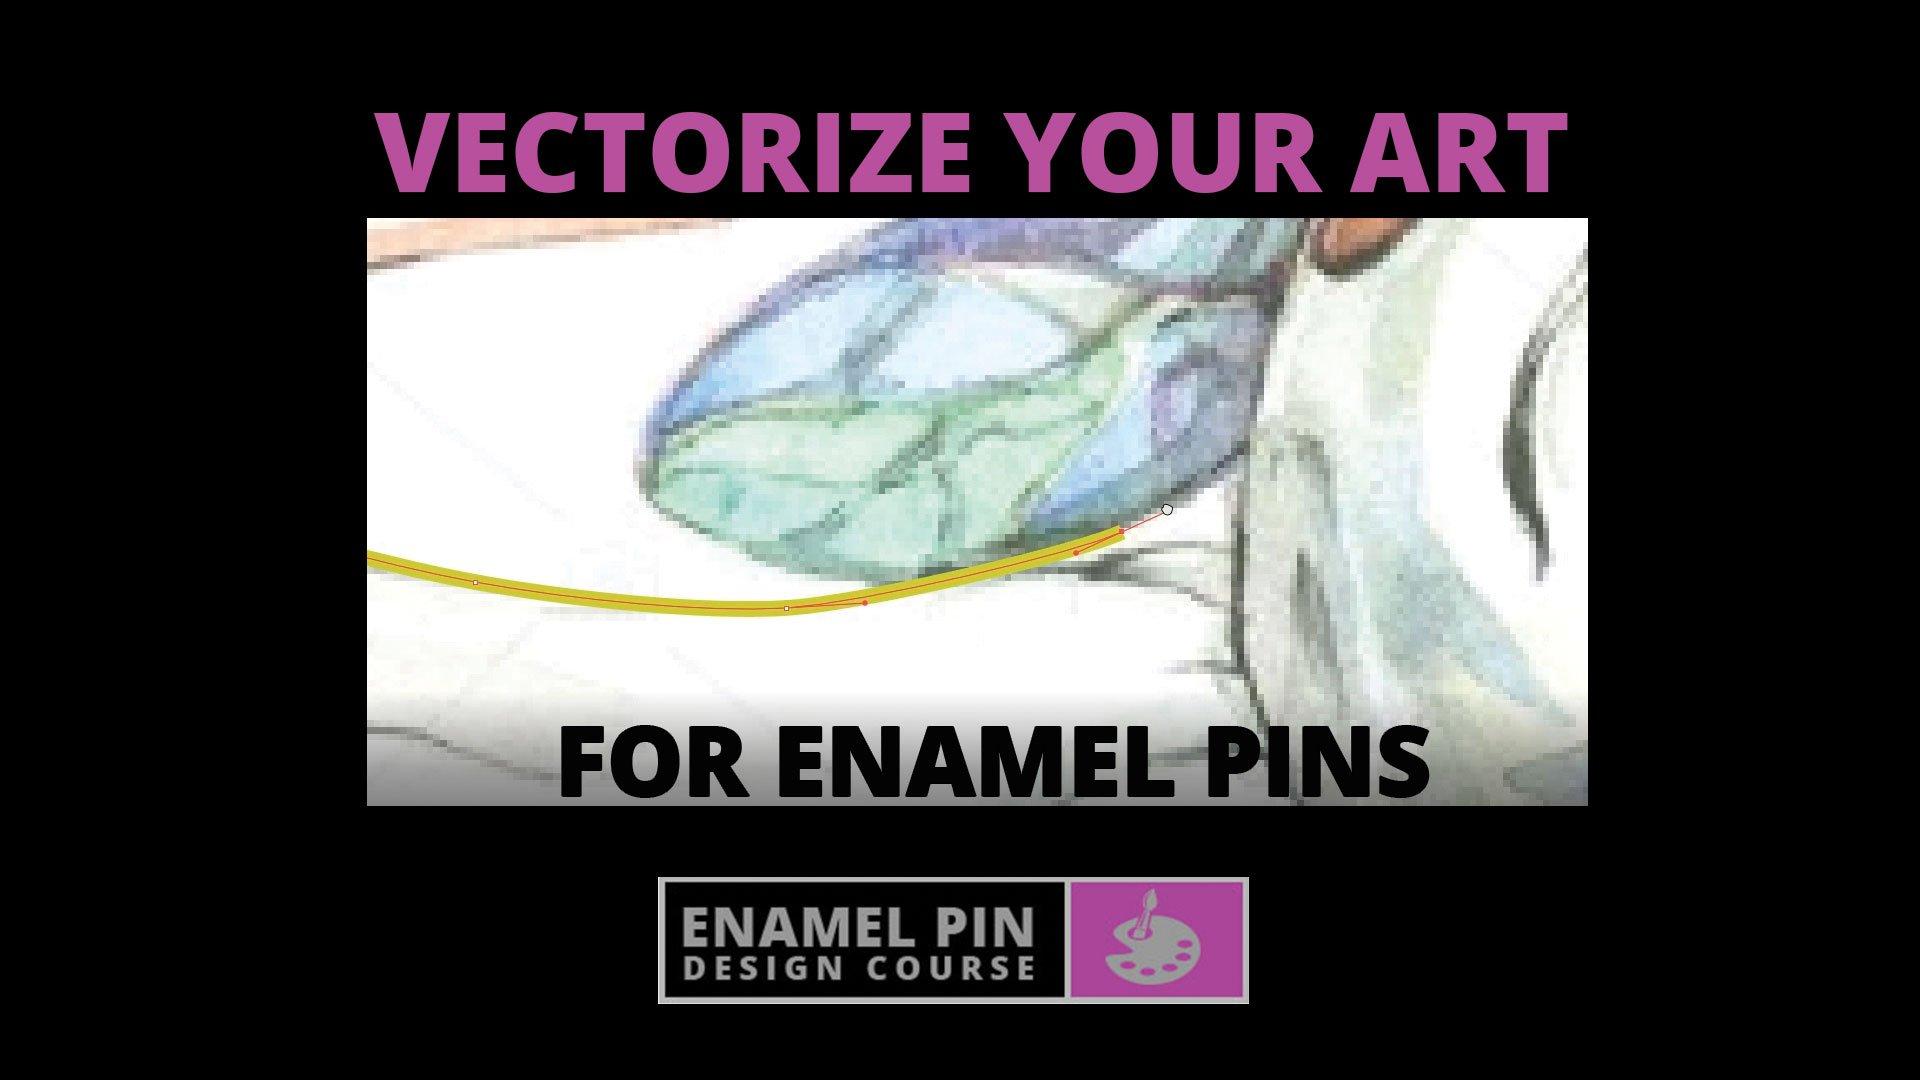 DIY Enamel Pin Design: Vectorizing Art In Adobe Illustrator